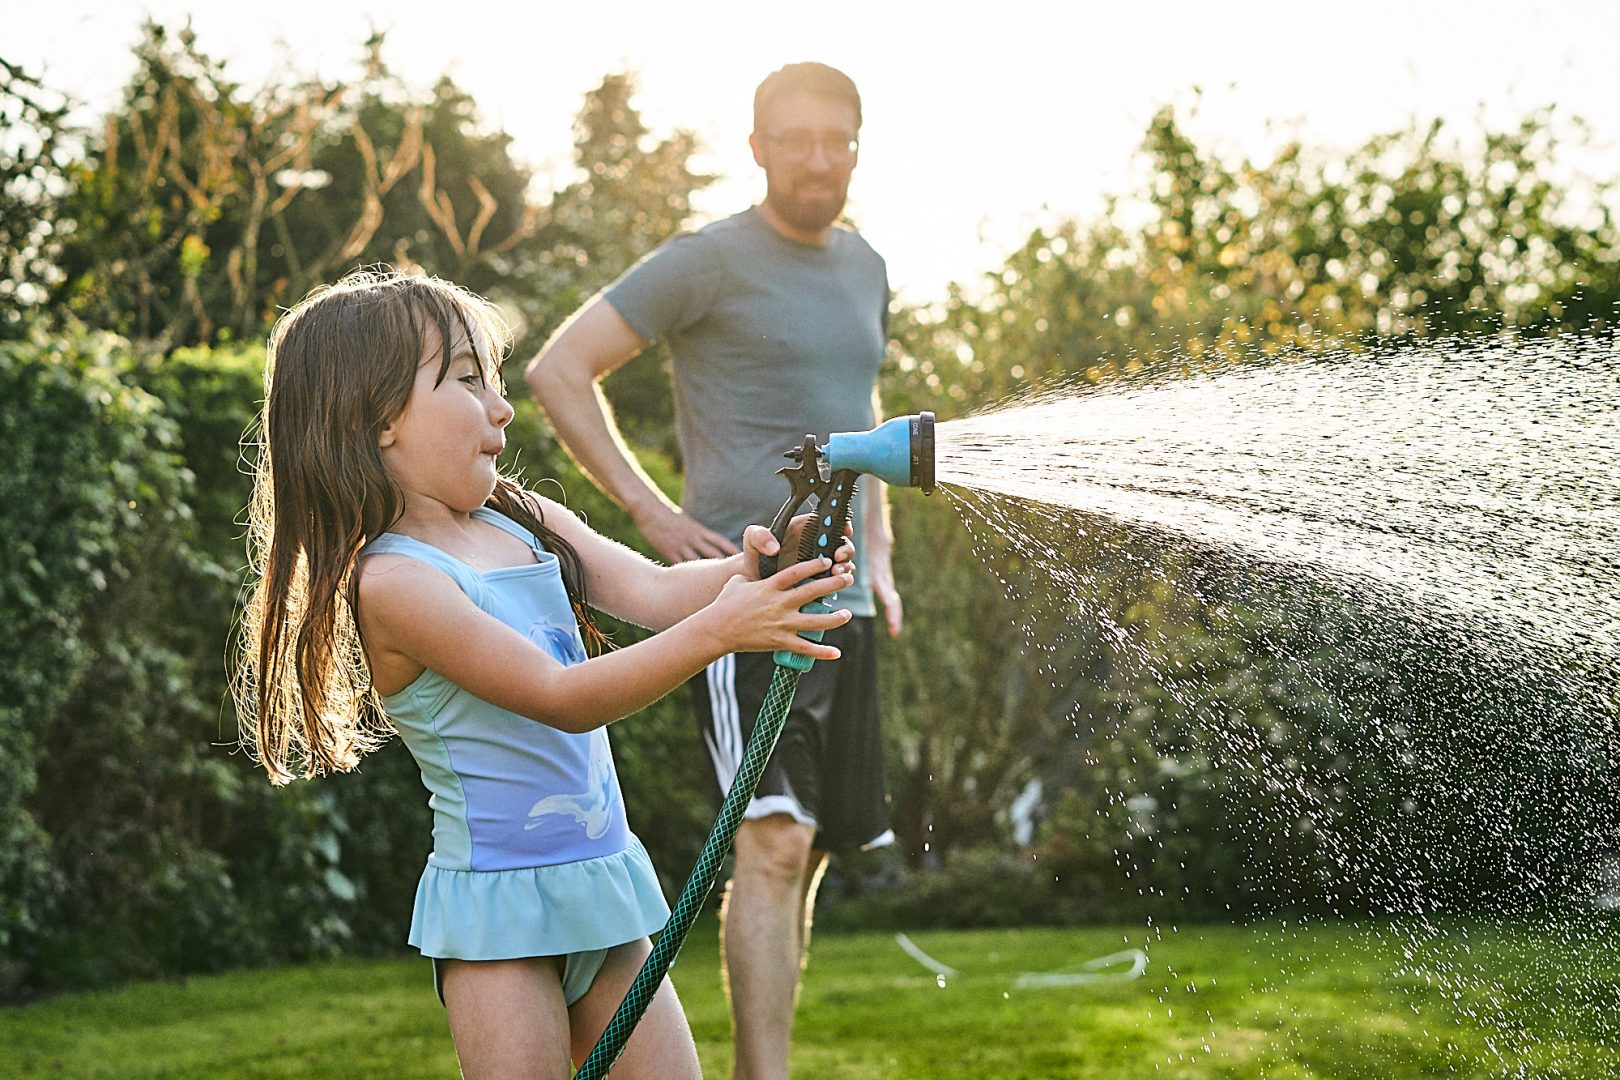 funny photo of girl spraying hose in garden in lancashire